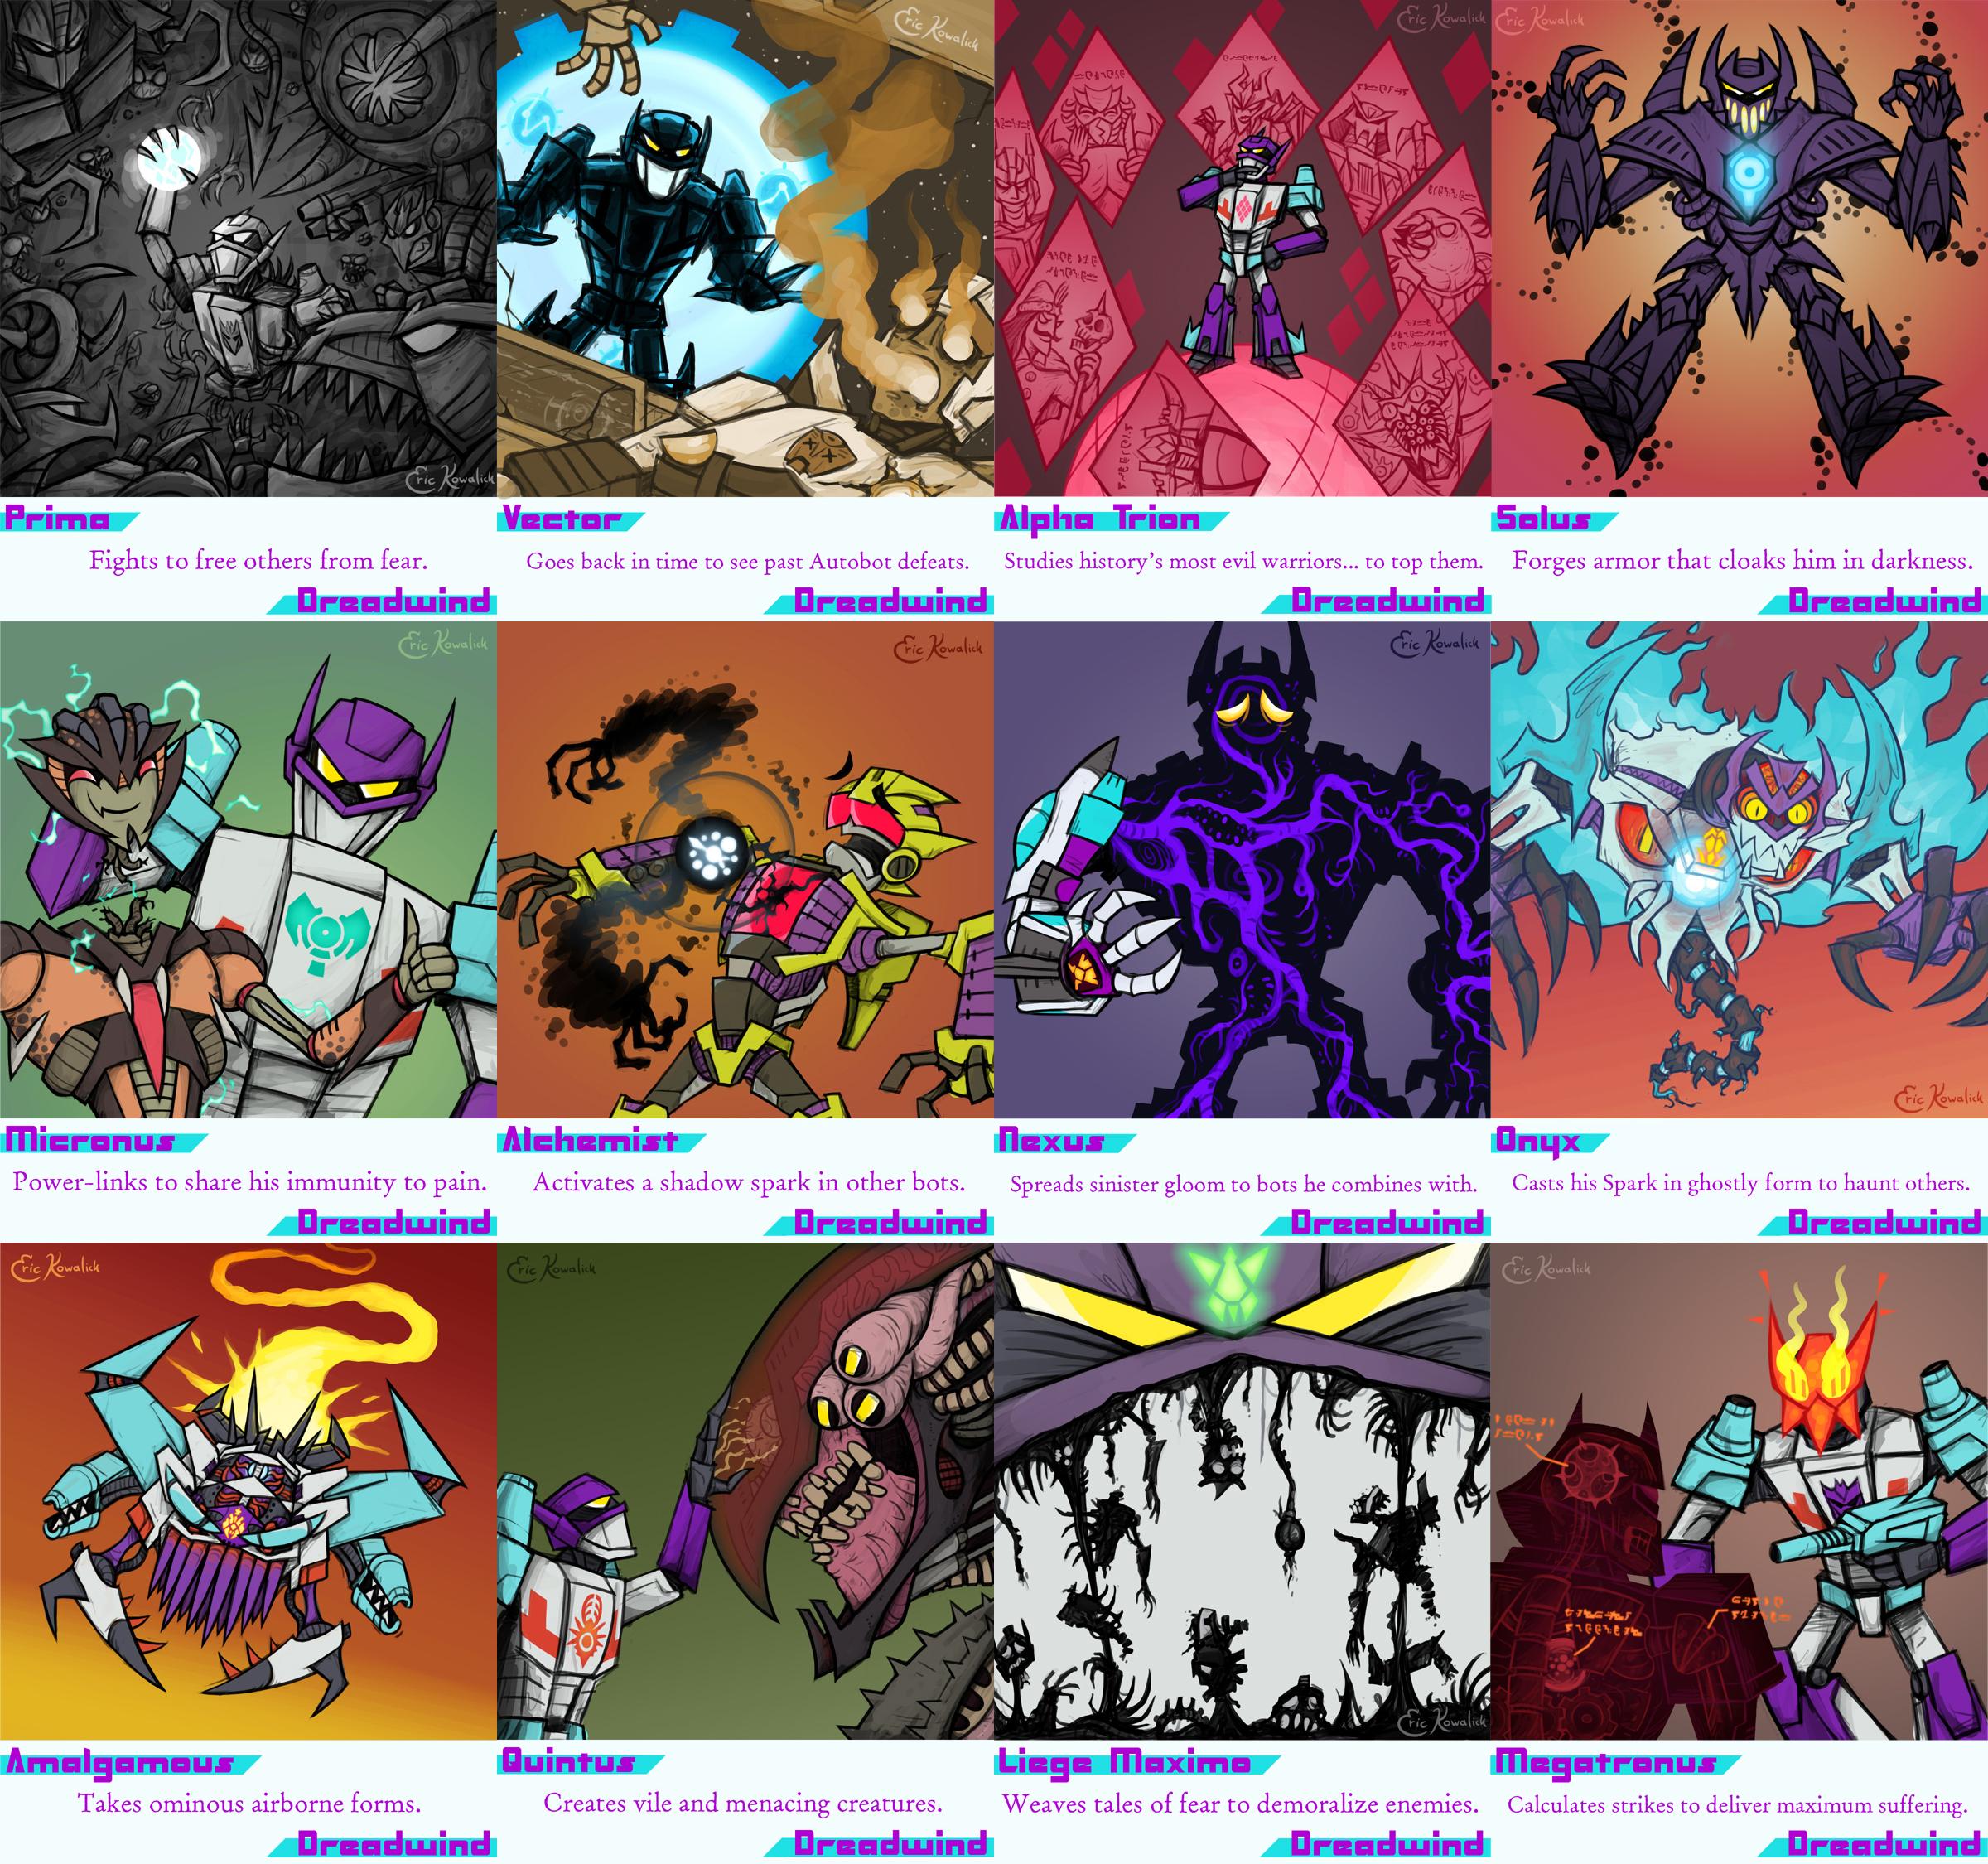 Sketchformers: Dreadwind by Monster-Man-08